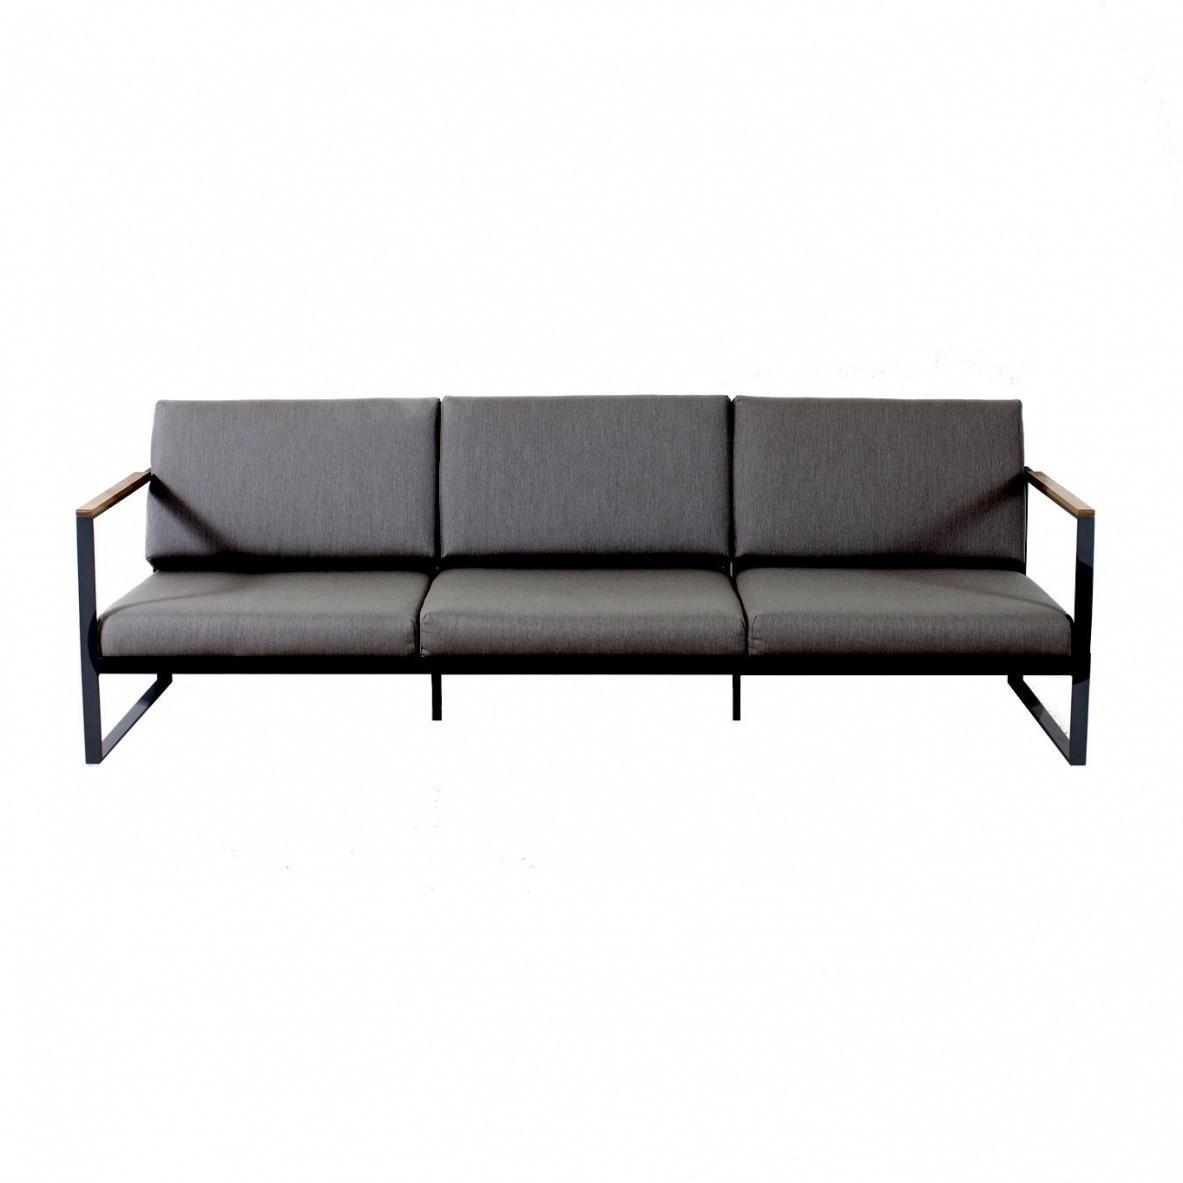 R shults garden easy 3 sitzer sofa ambientedirect - Gartensofa 3 sitzer ...